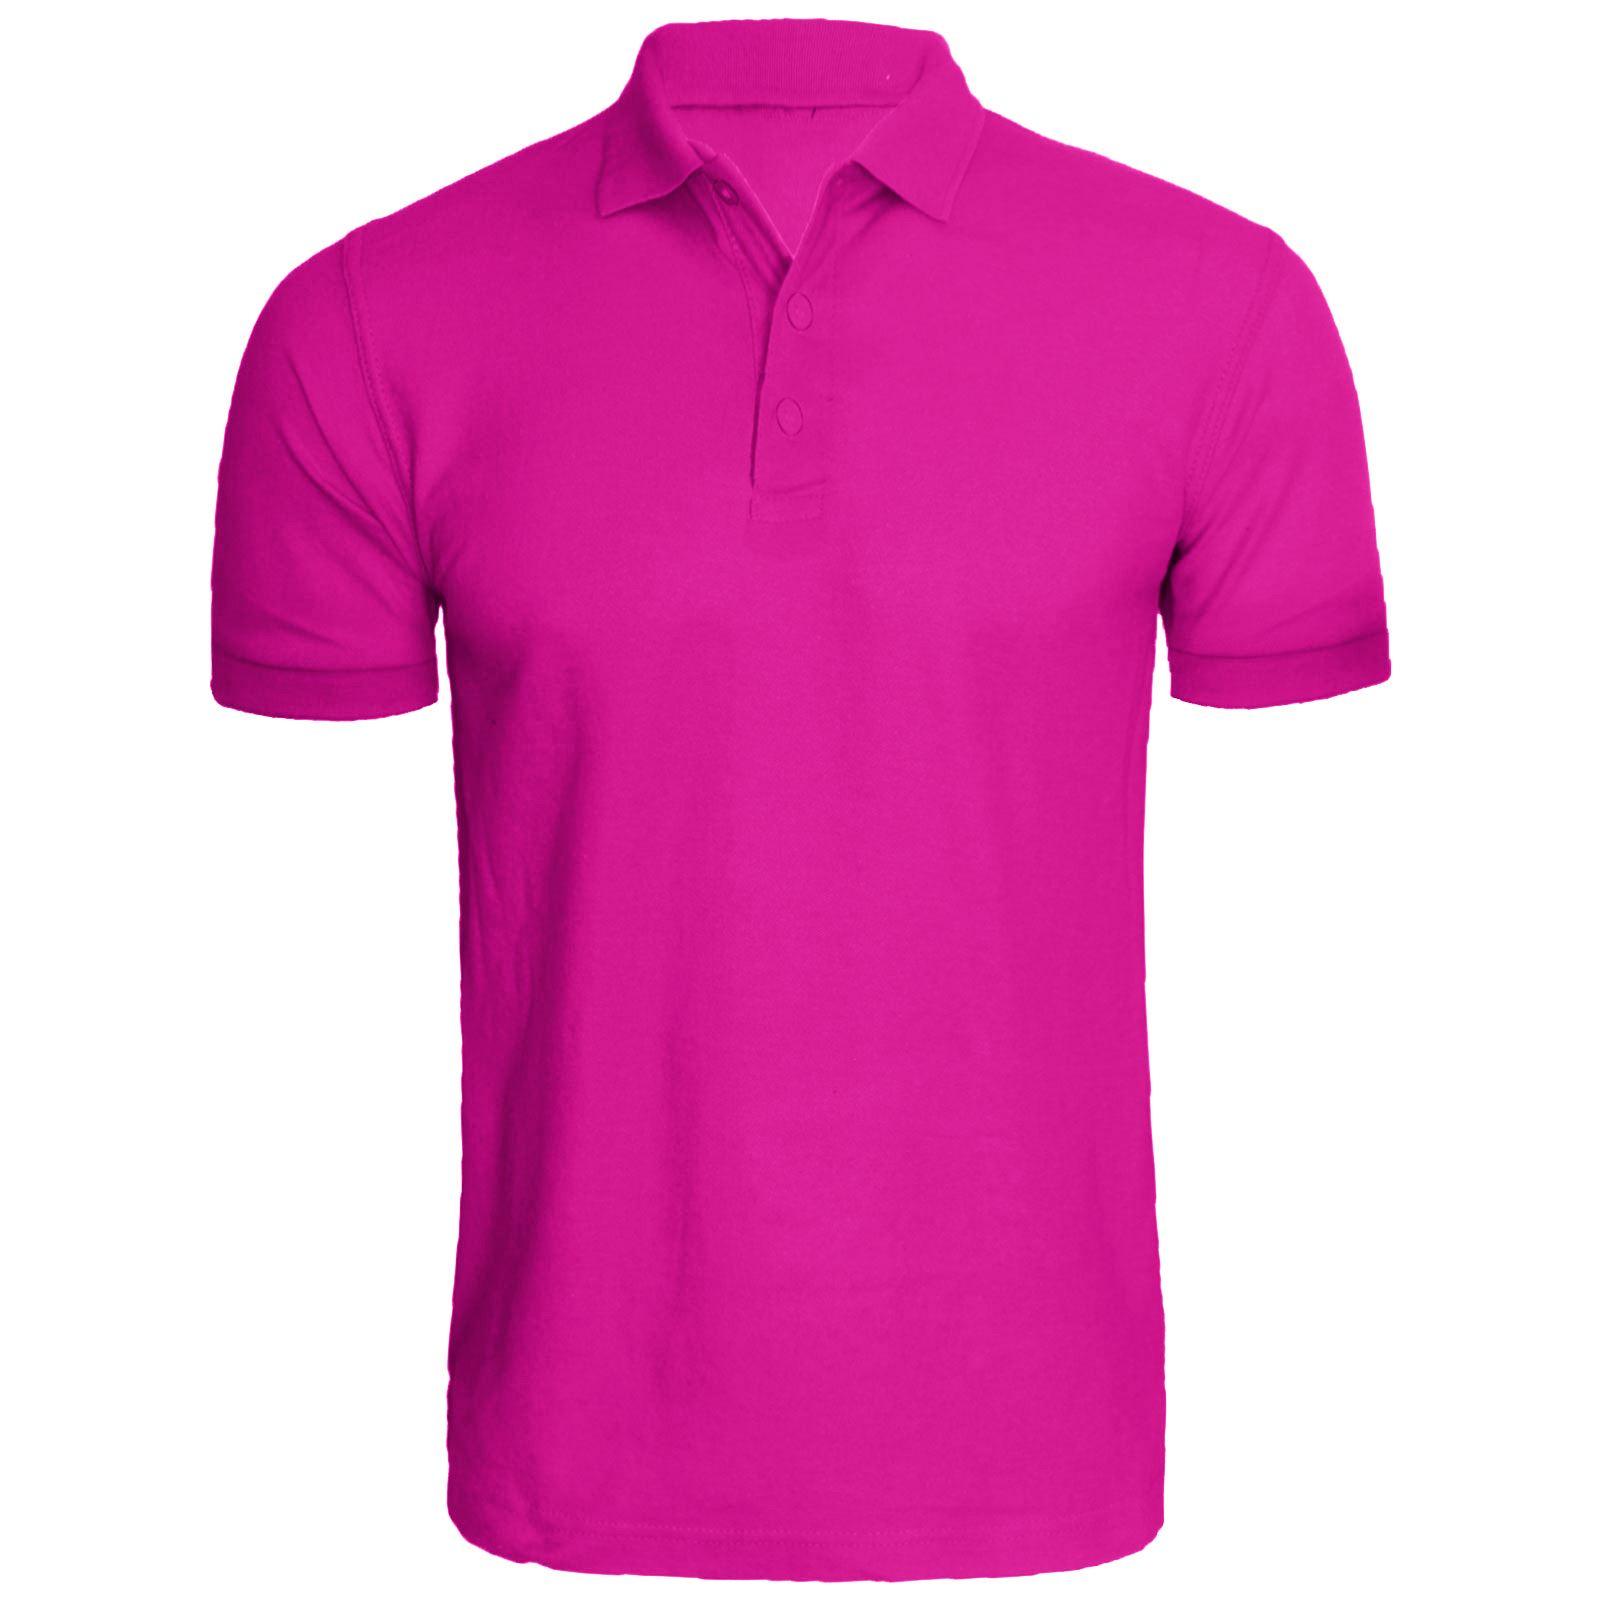 New mens polo shirt plain t shirt blank short sleeve shirt for Mens pink shirts uk